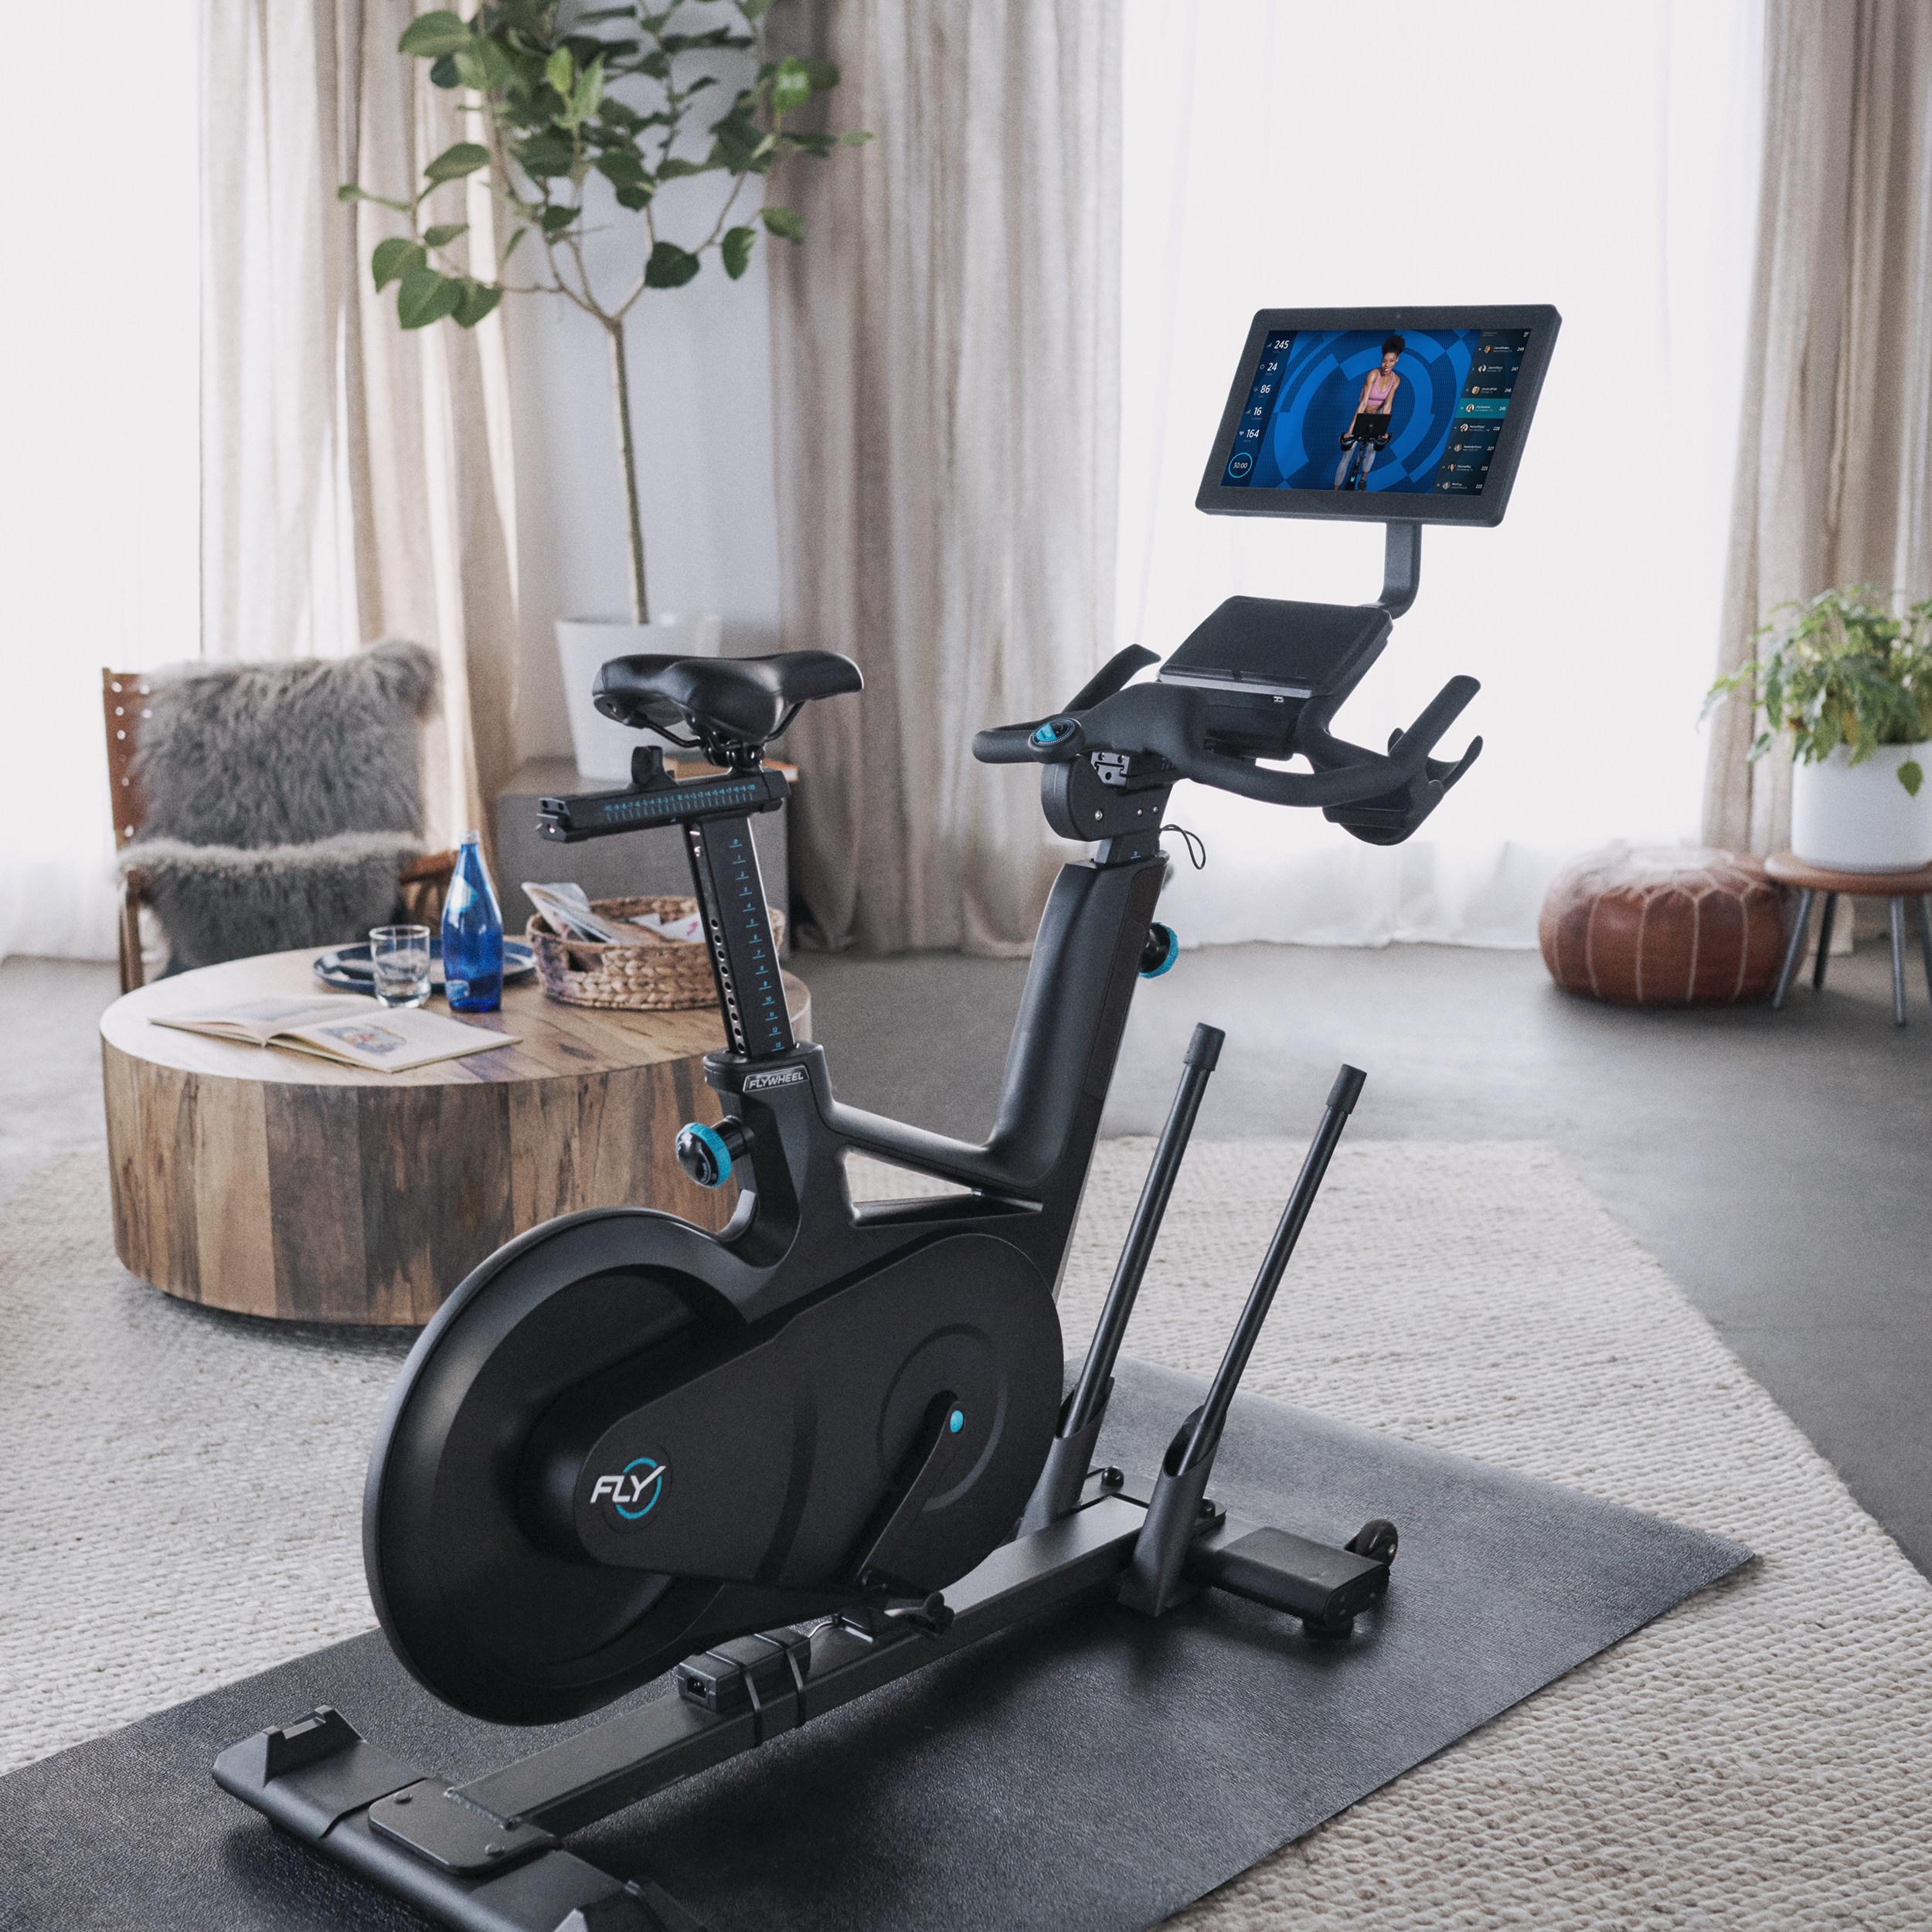 Flywheel Home Bike Now Available On Amazon.com